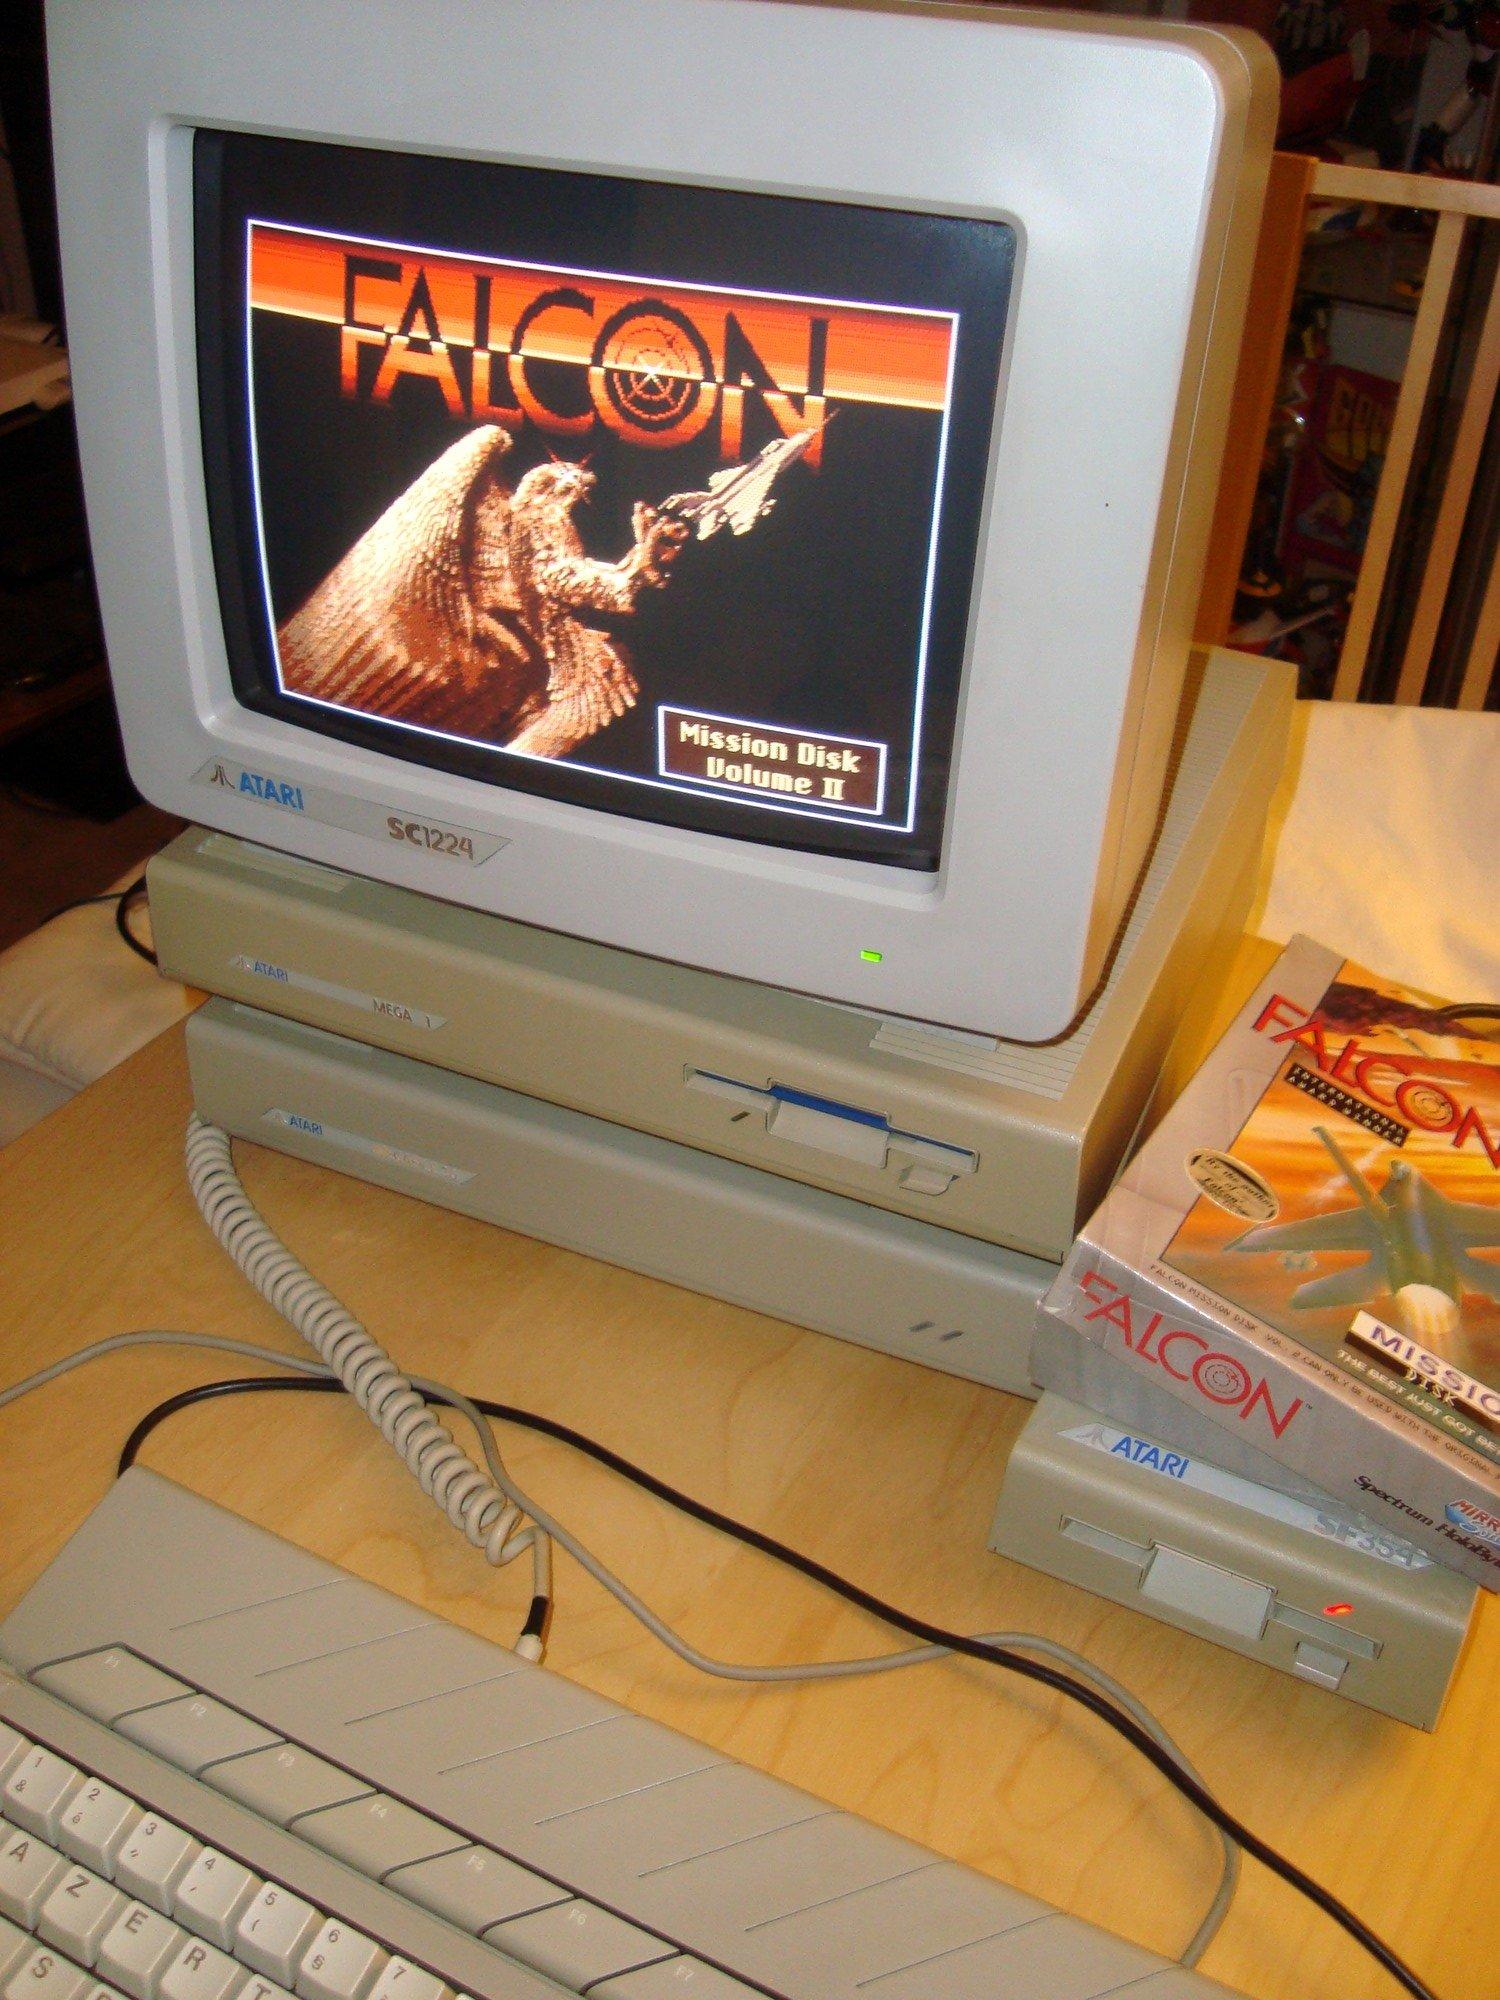 [TEST] Lecteurs disquettes externes SF354/SF314 - Atari ST 201019124147530836